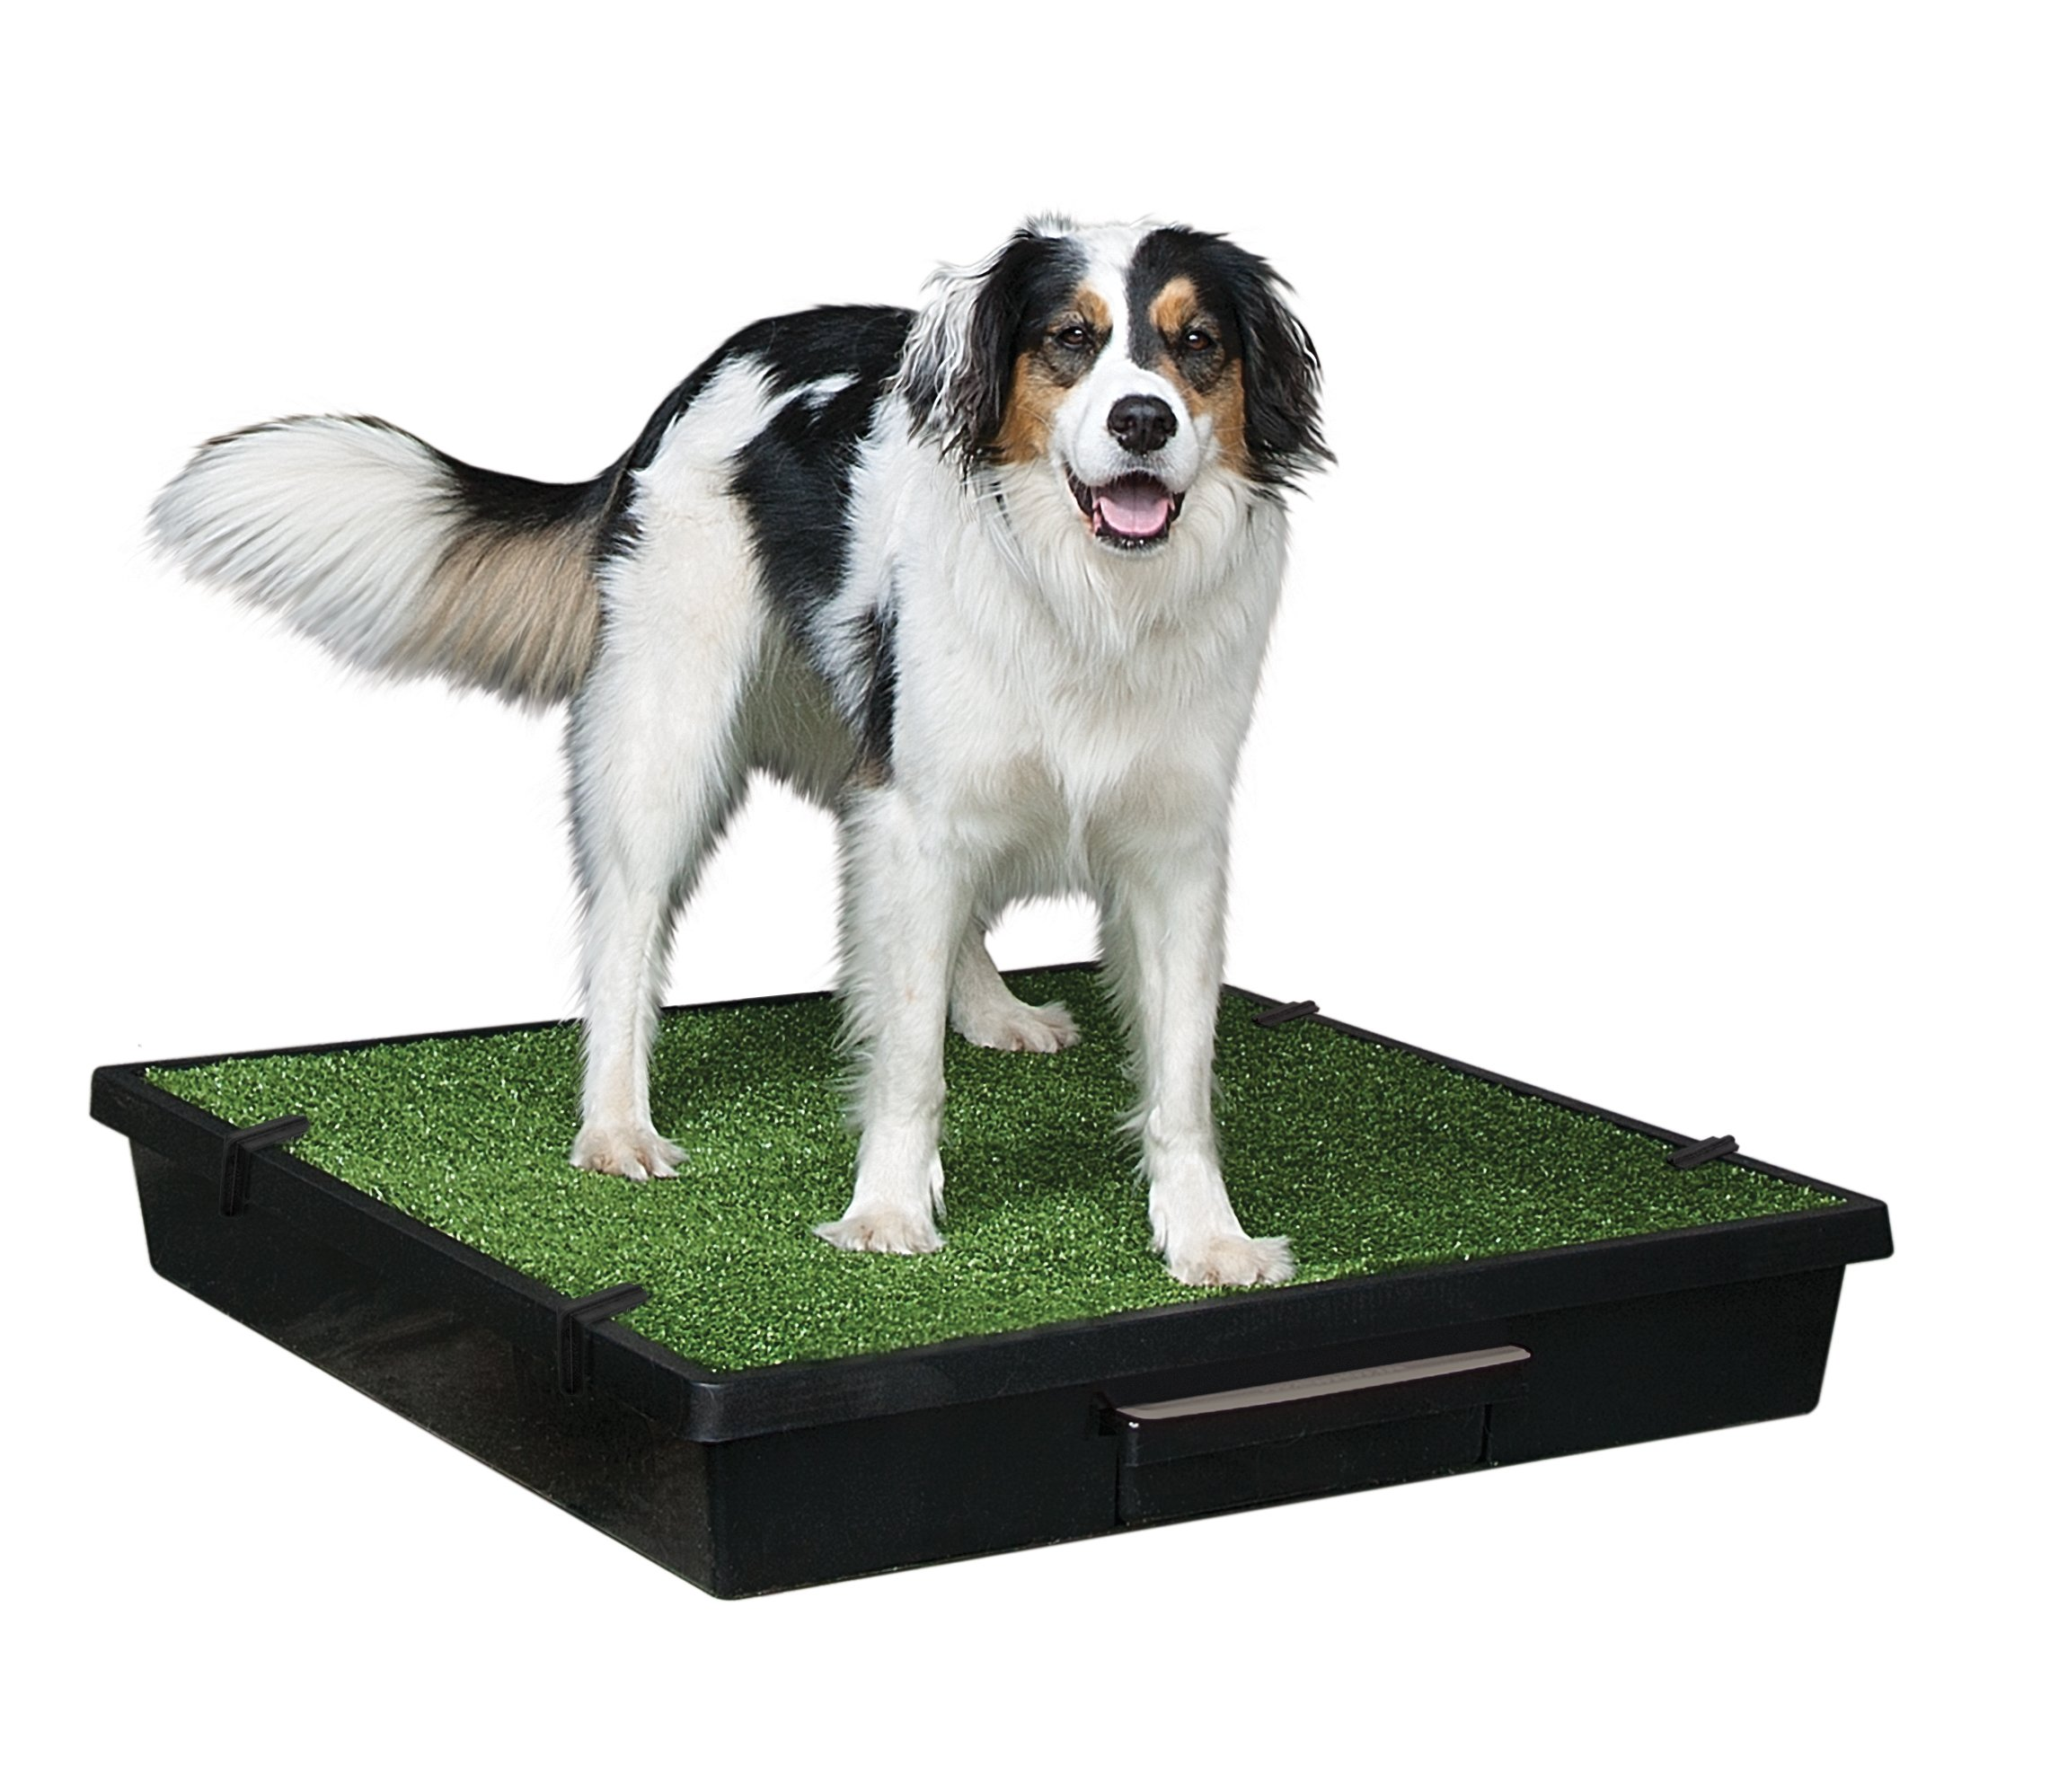 PetSafe Pet Loo Portable Dog Potty, Alternative to Pee Pads, Large by PetSafe